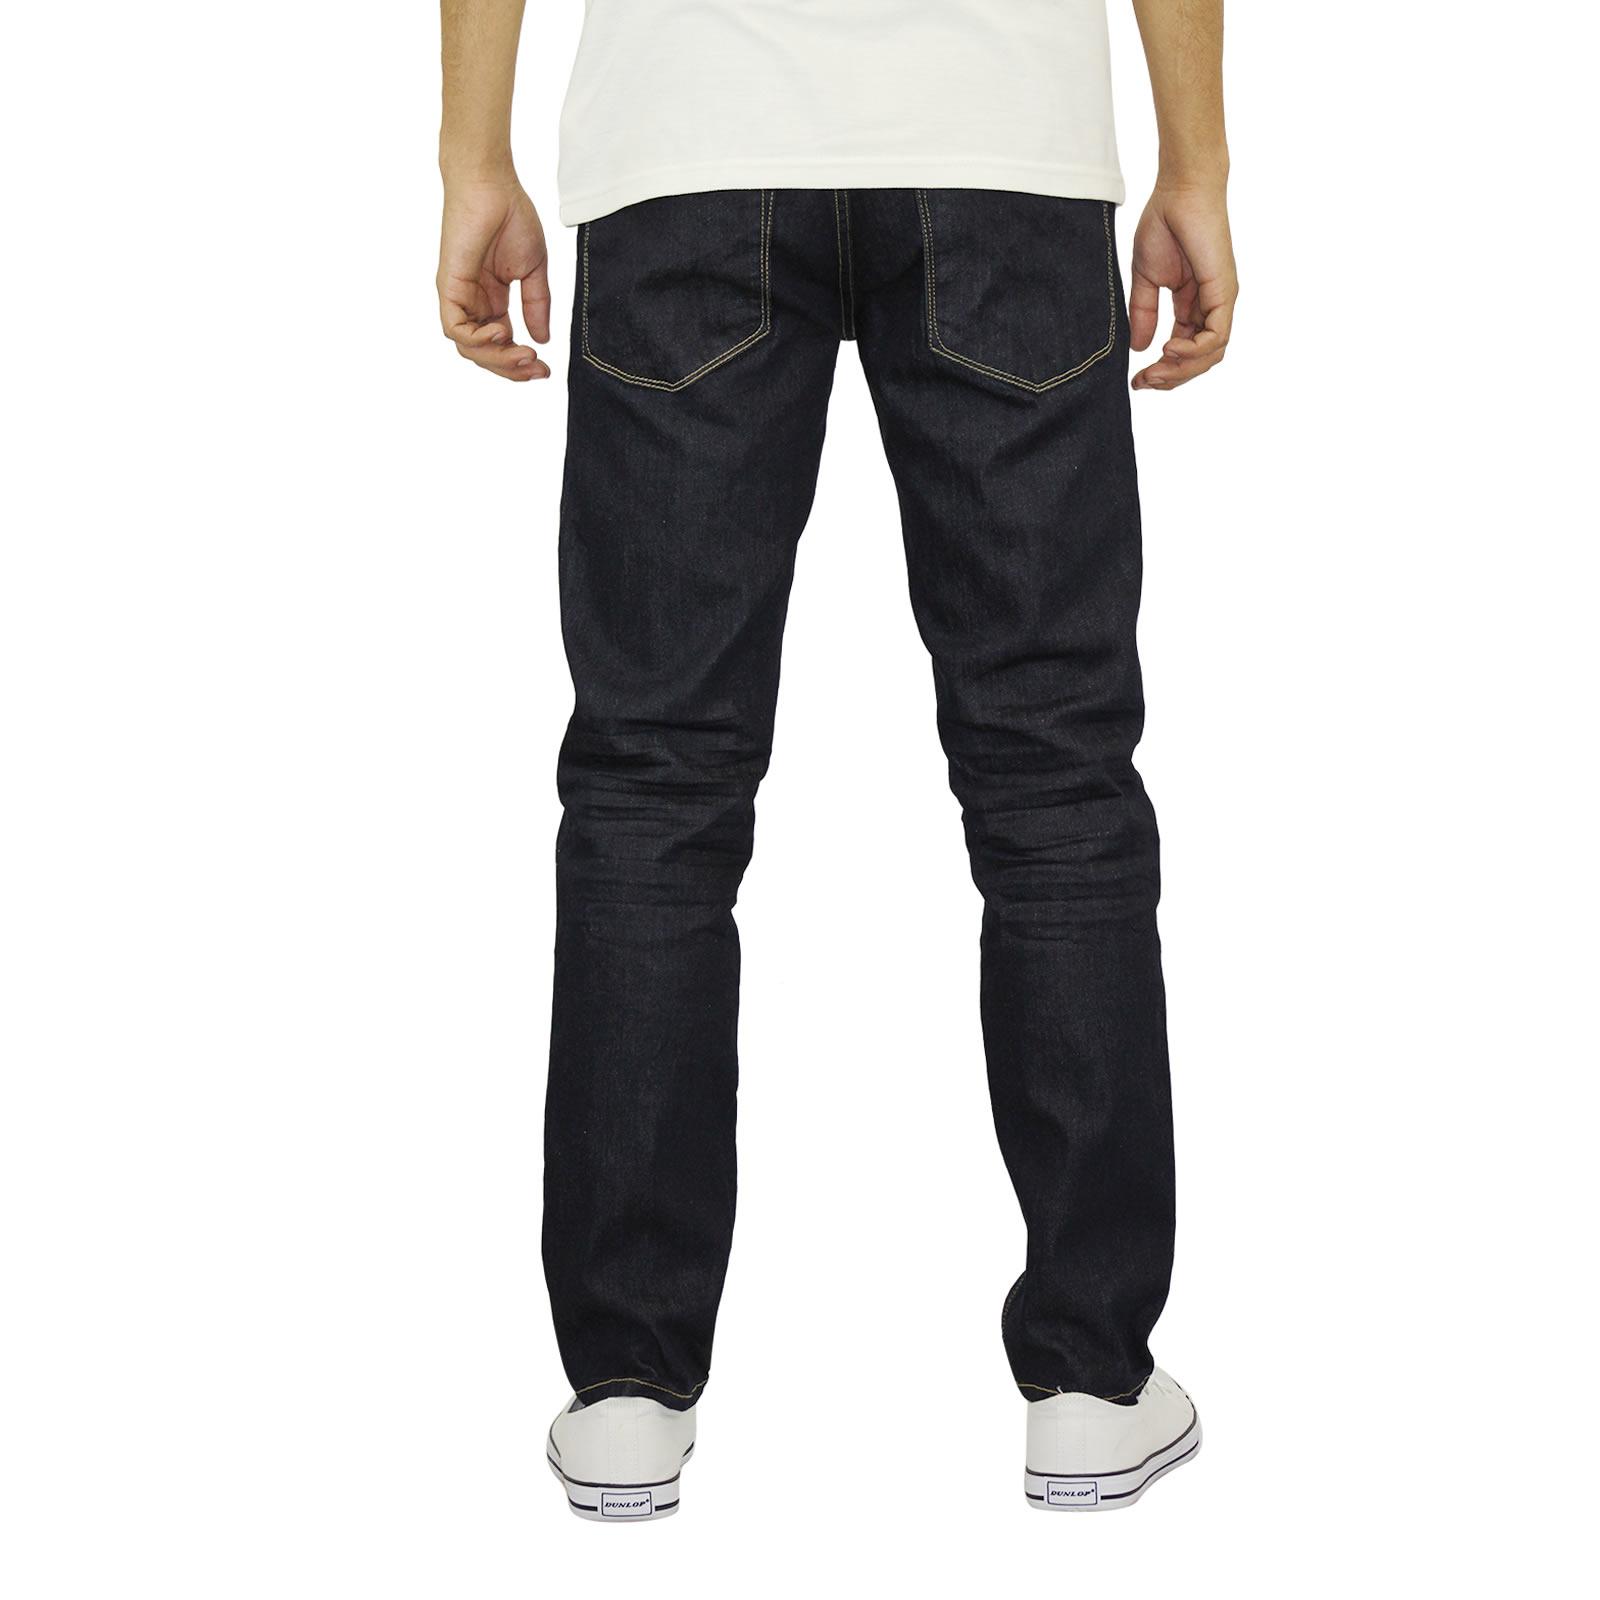 miniature 13 - Homme Crosshatch Jaco Slim Jeans stretch pantalon denim effet vieilli